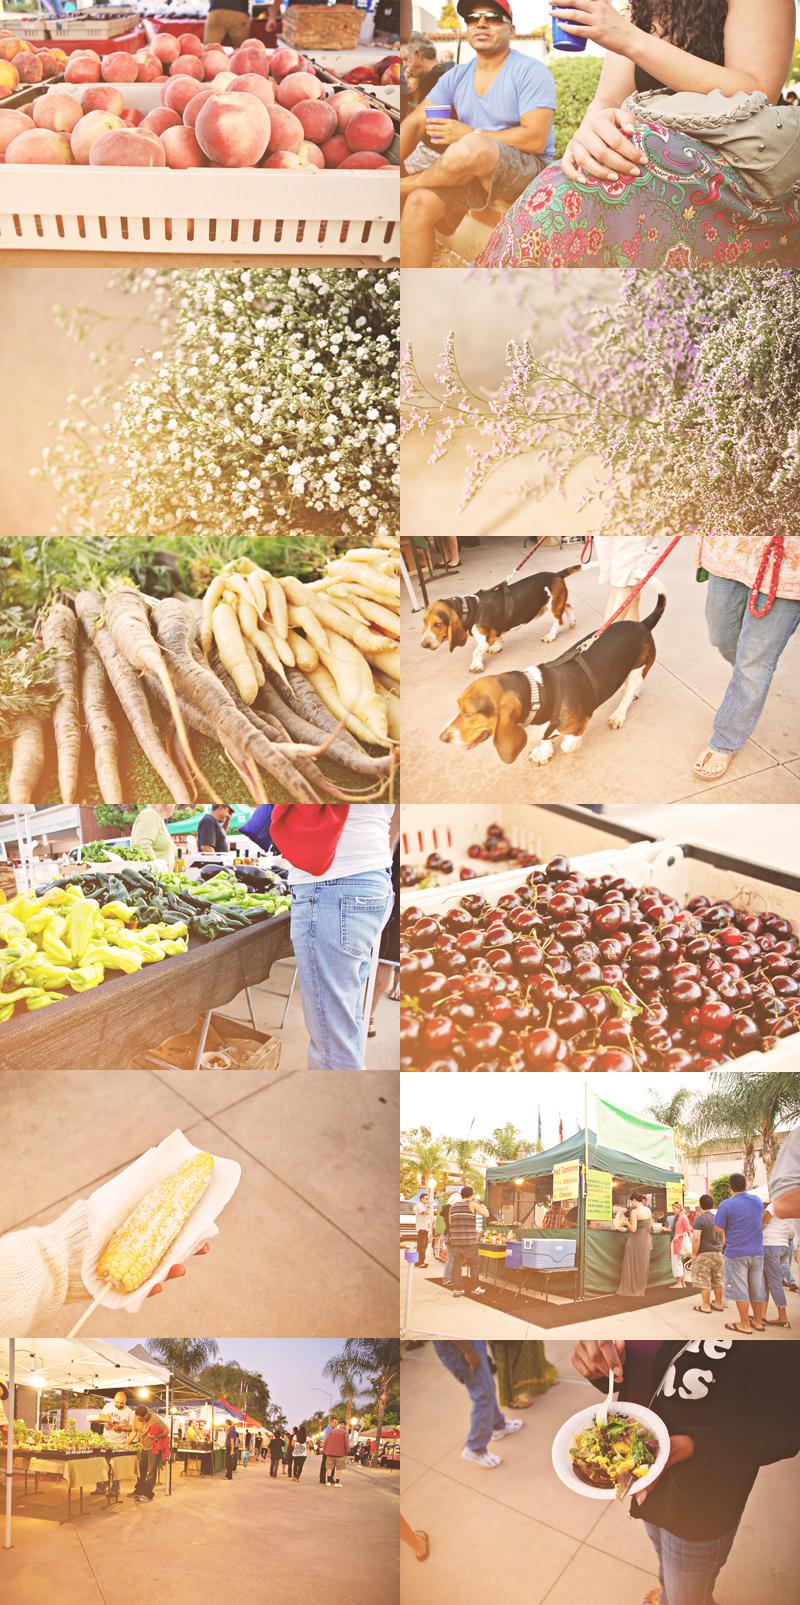 Fullerton farmers market